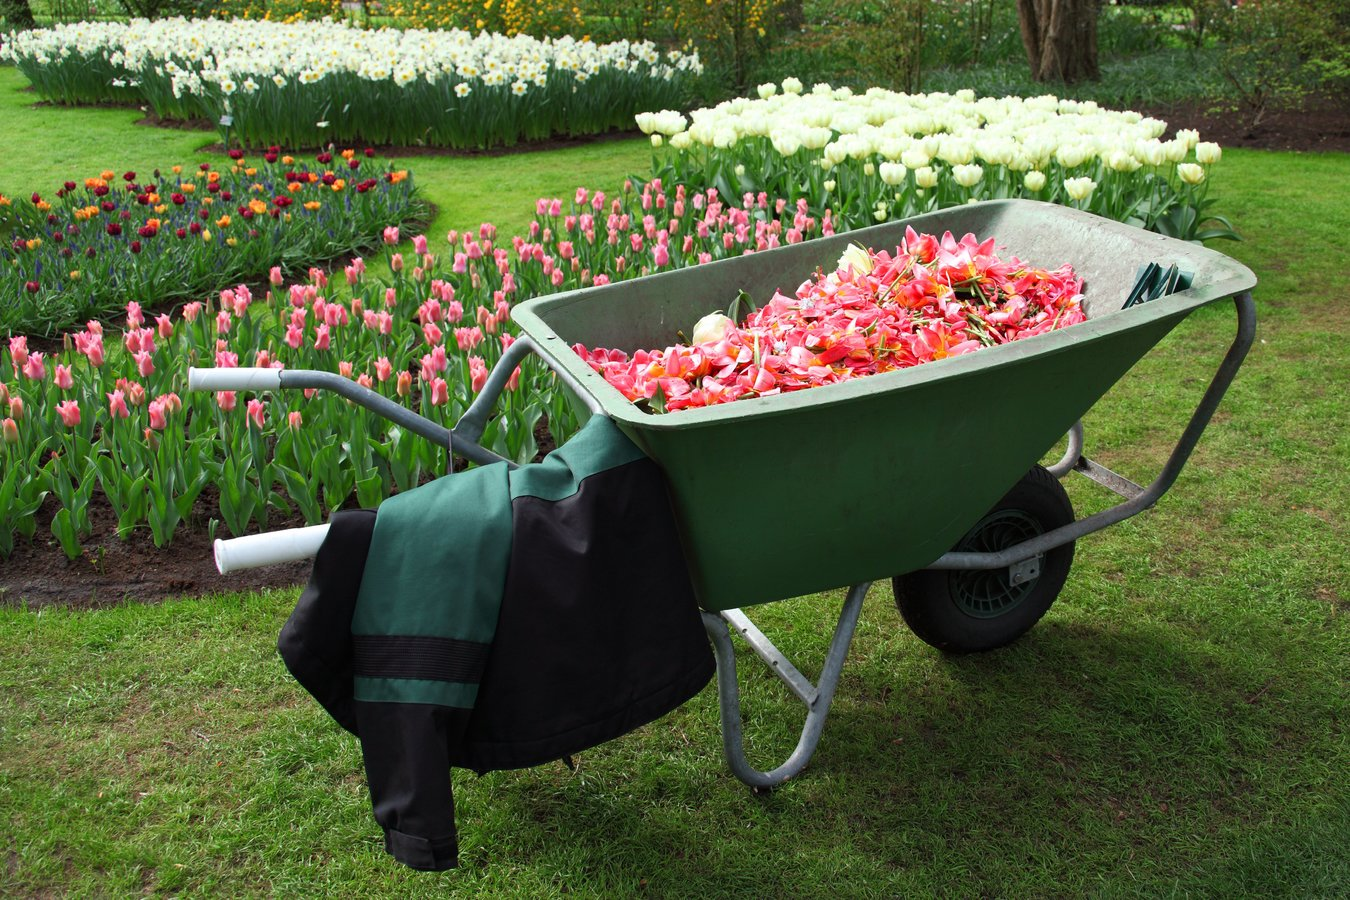 work-grass-plant-lawn-wheel-cart-1159034-pxherecom